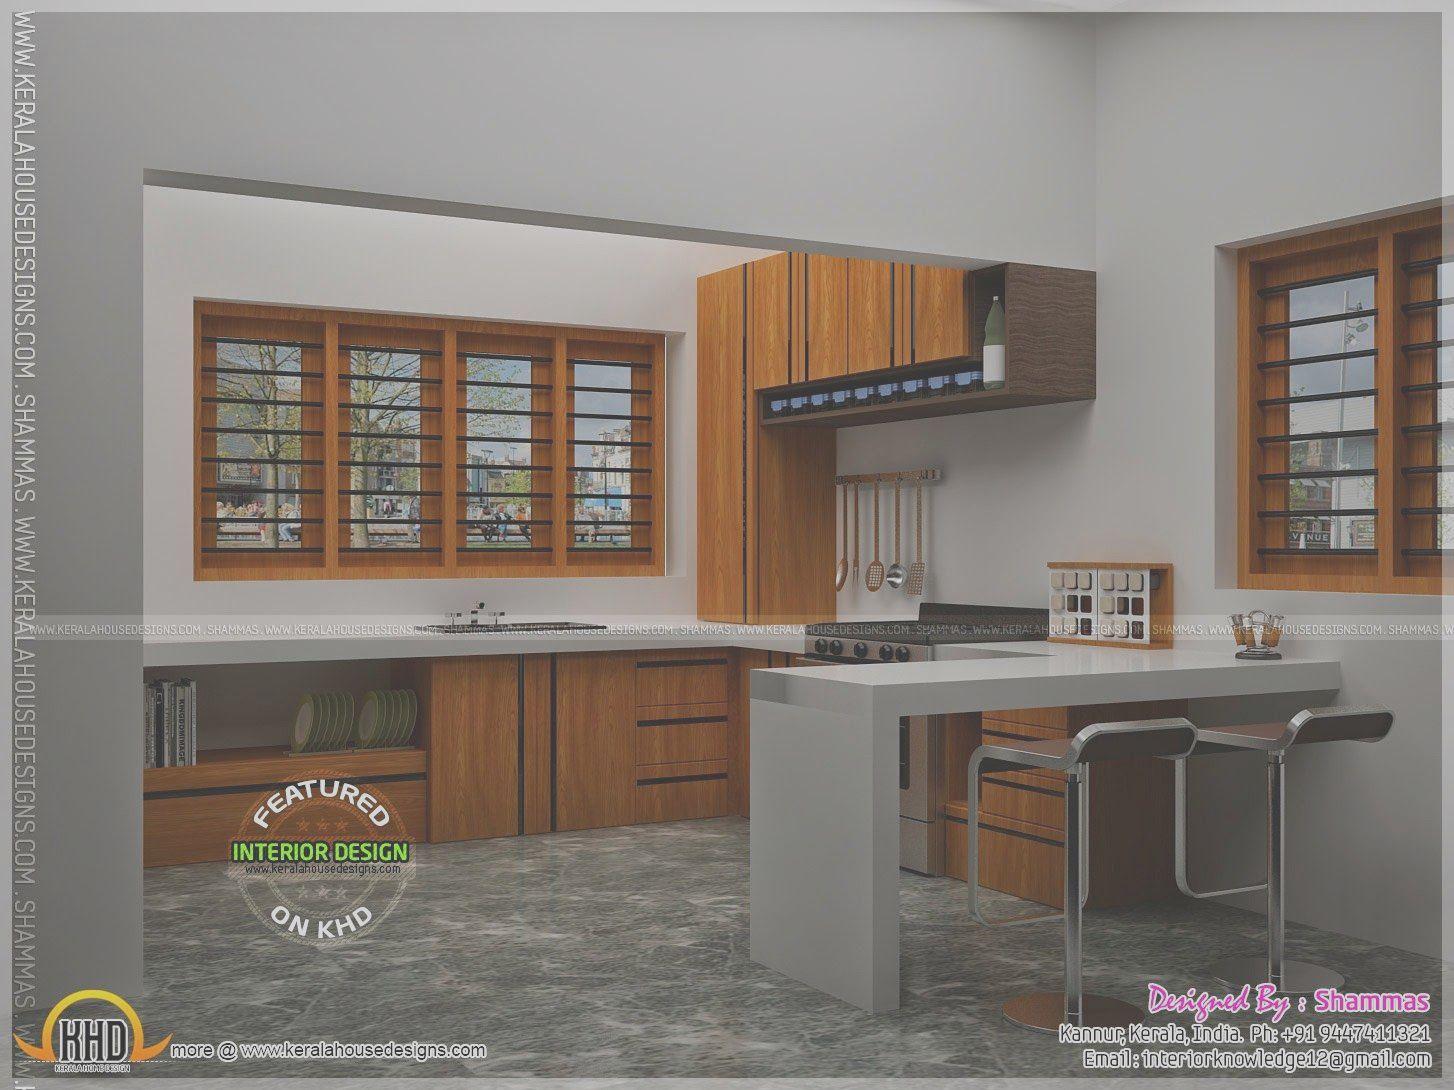 11 Majestic Kitchen Interior Kerala Style Image In 2020 Interior Design Kitchen Kitchen Interior Kitchen Remodel Small